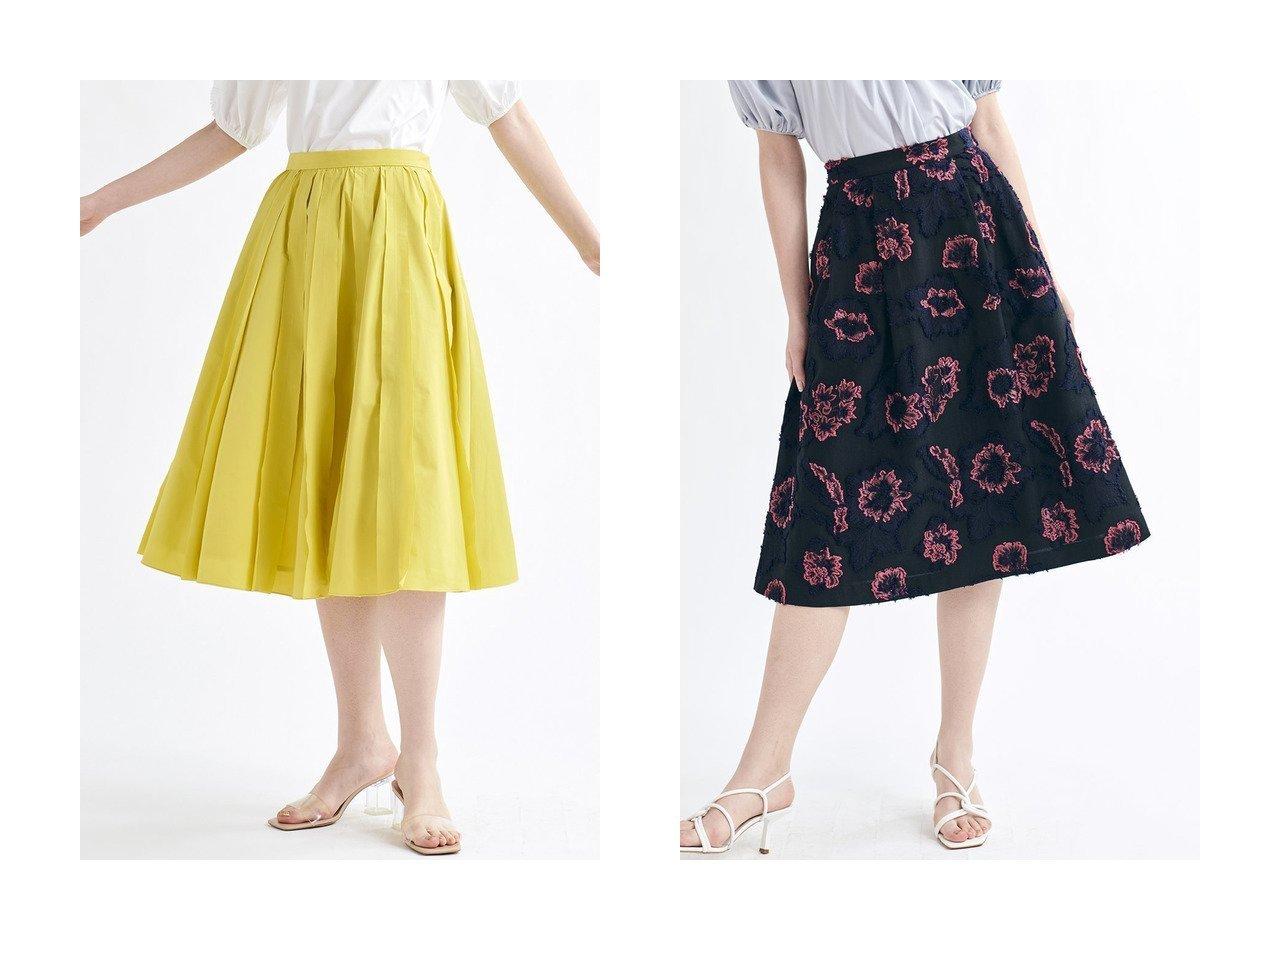 【LANVIN en Bleu/ランバン オン ブルー】のギャザーフレアタックスカート&フラワージャガードスカート 【スカート】おすすめ!人気、トレンド・レディースファッションの通販  おすすめで人気の流行・トレンド、ファッションの通販商品 メンズファッション・キッズファッション・インテリア・家具・レディースファッション・服の通販 founy(ファニー) https://founy.com/ ファッション Fashion レディースファッション WOMEN スカート Skirt ロングスカート Long Skirt 2021年 2021 2021 春夏 S/S SS Spring/Summer 2021 S/S 春夏 SS Spring/Summer エレガント コンパクト シンプル ジャカード バランス フリンジ フレア ロング 春 Spring |ID:crp329100000025505